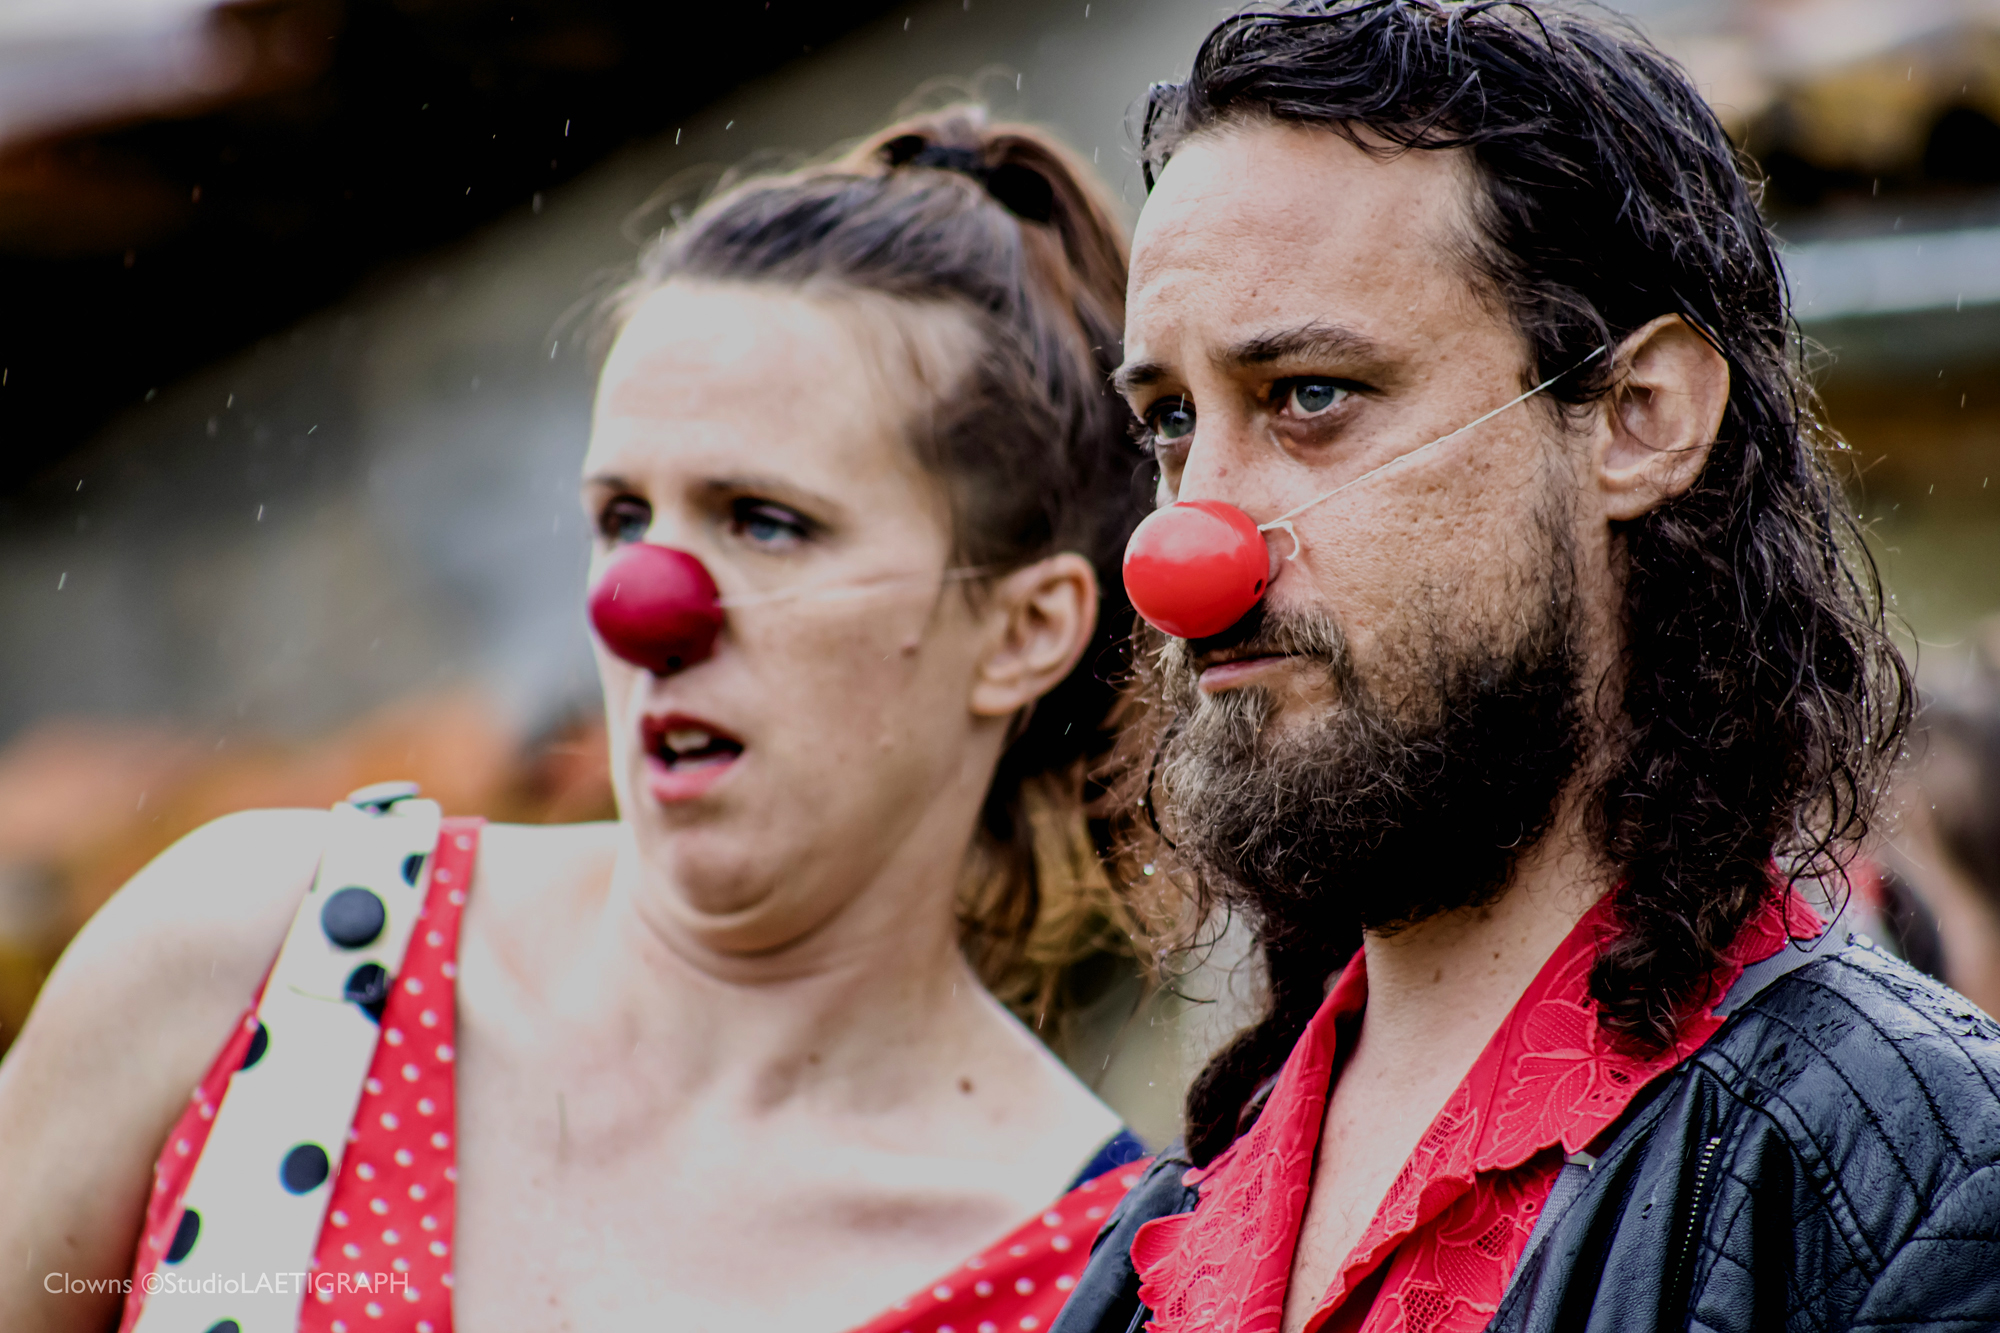 LMDCB21_clowns-89_1